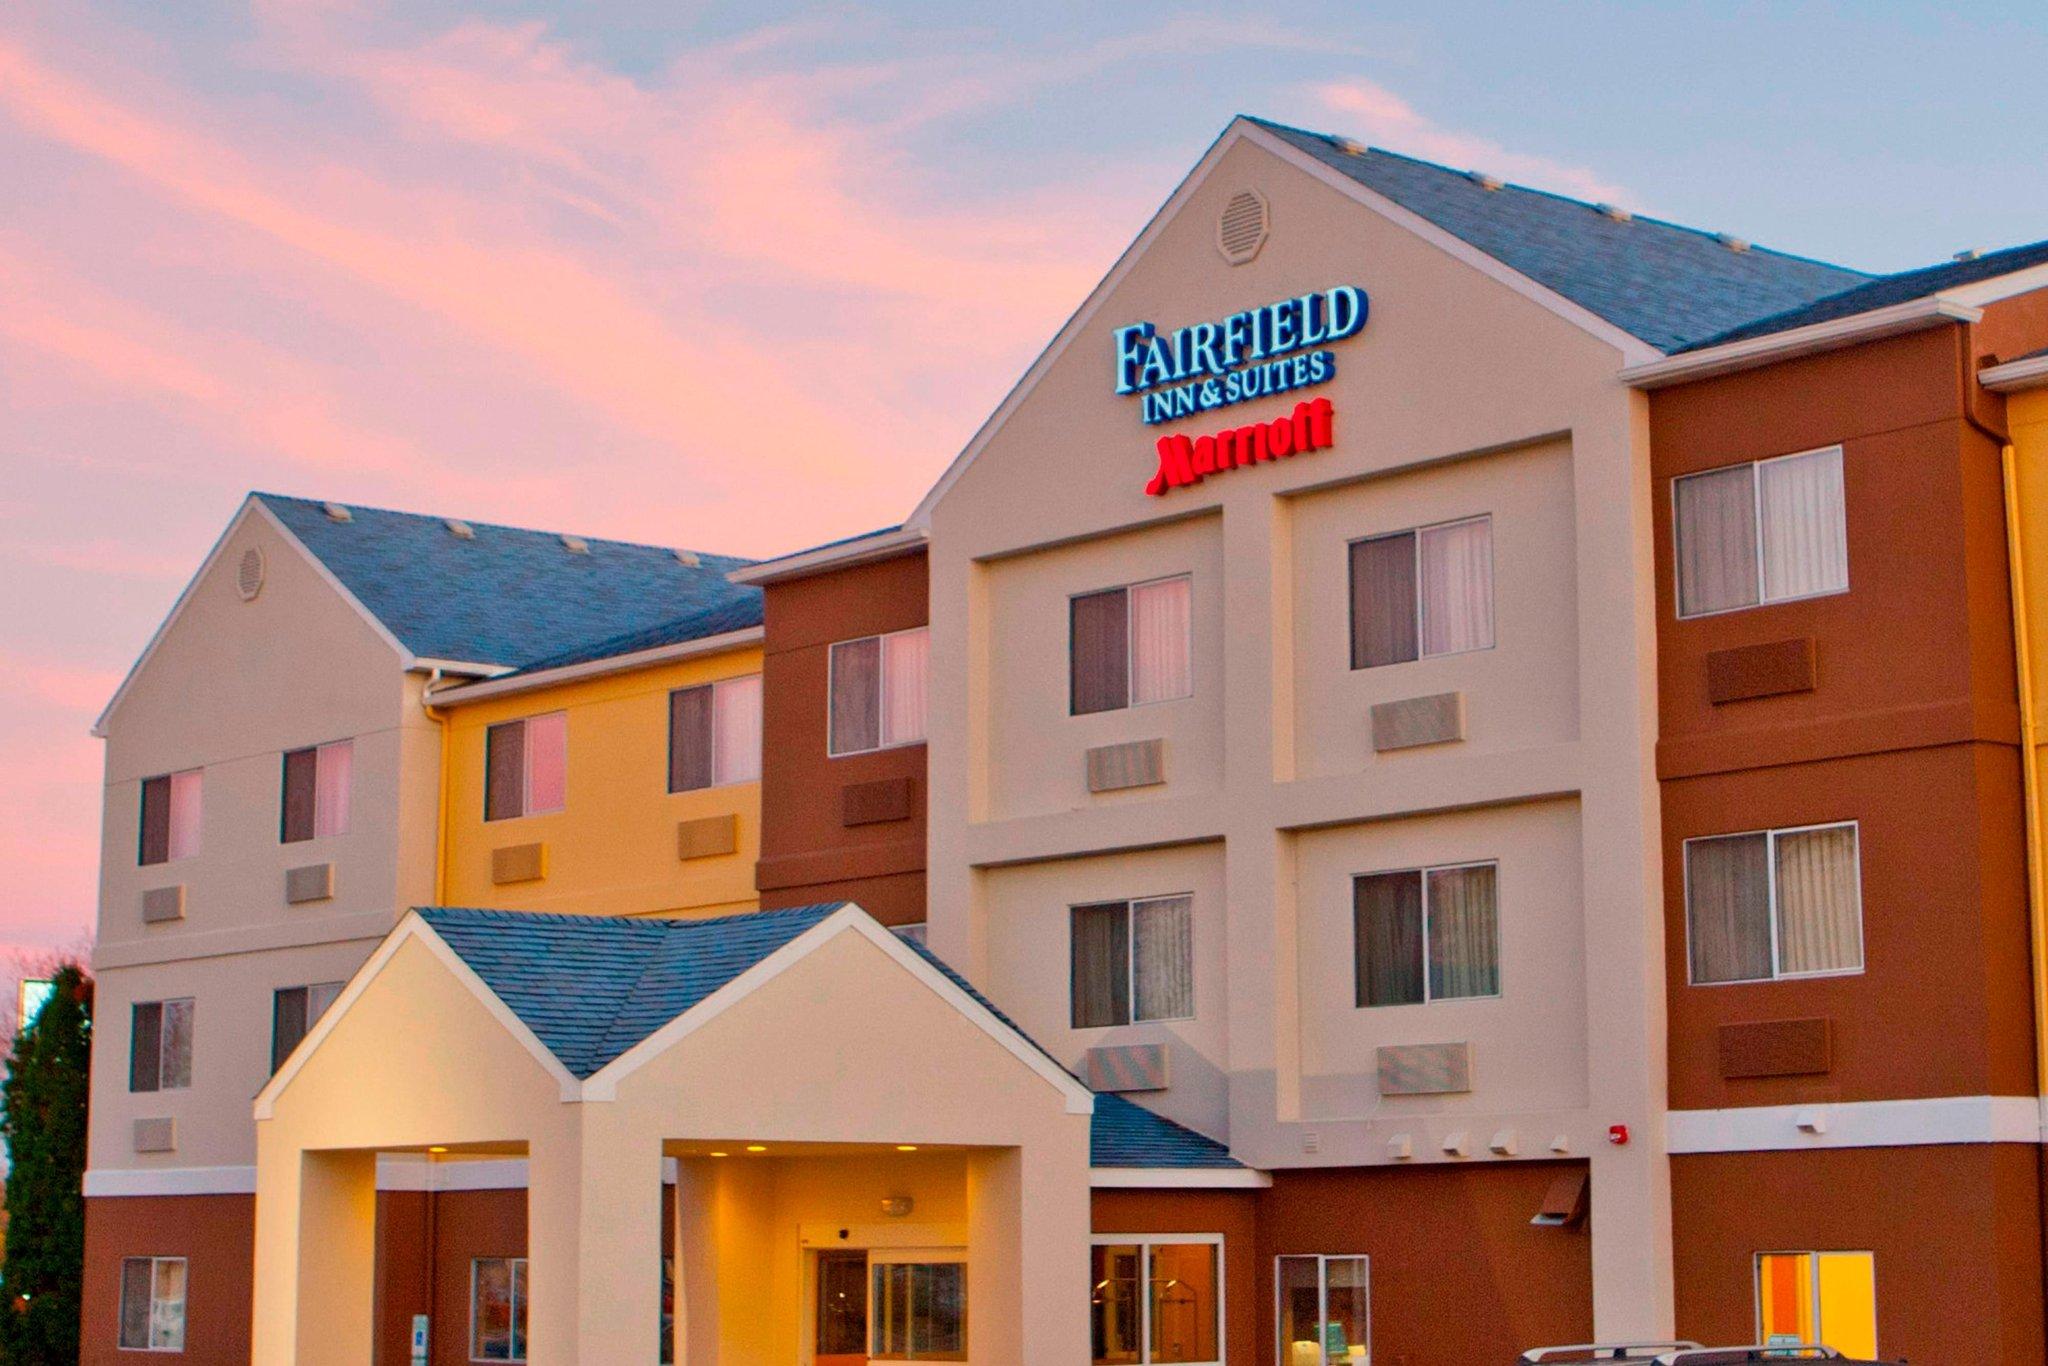 Fairfield Inn and Suites by Marriott Joliet North/Plainfield